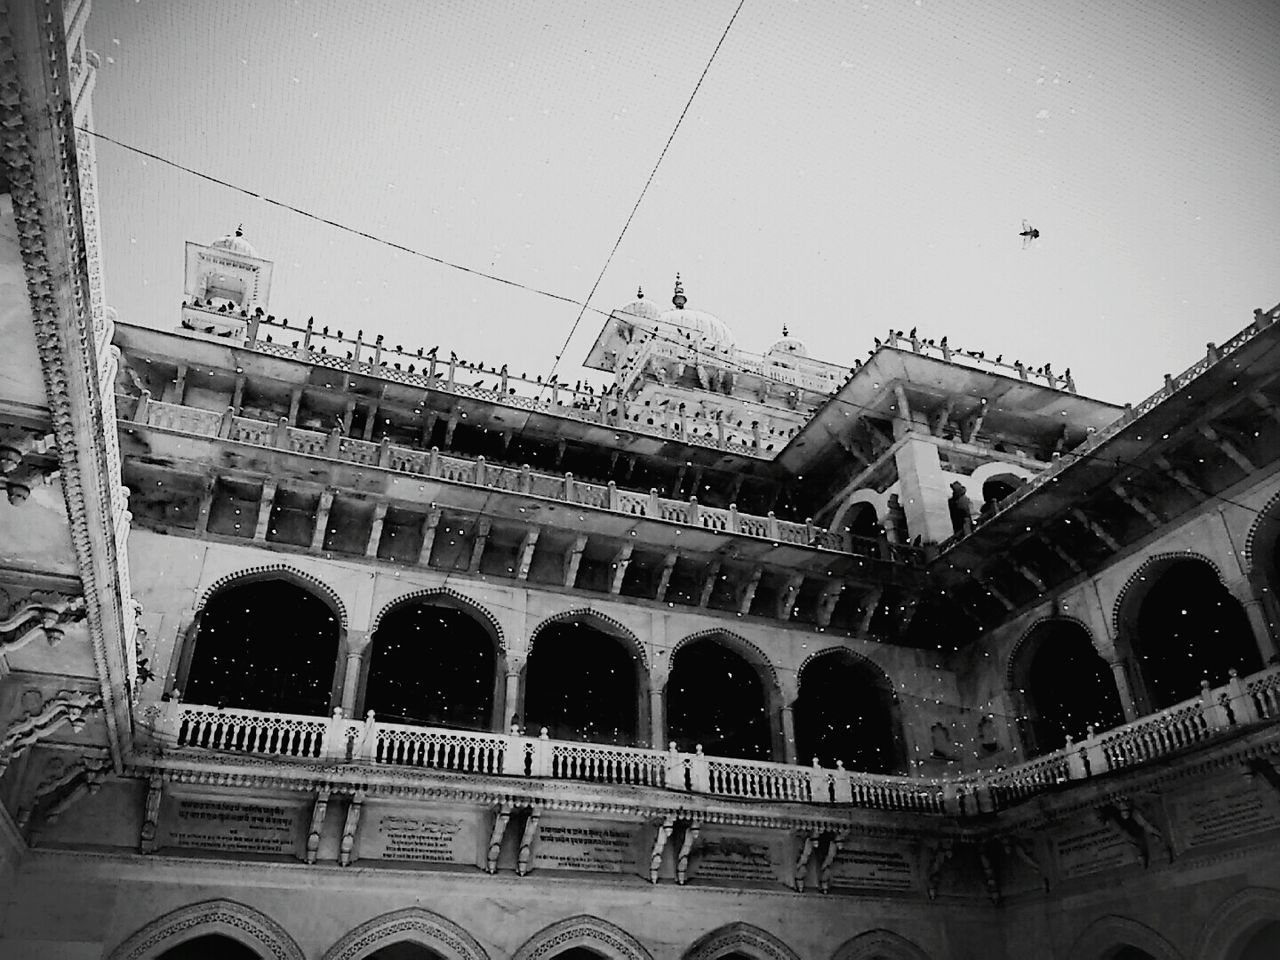 Heritage Heritagebuilding Heritagestructure Alberthallmuseumjaipur Jaipur Rajasthan Jaipurdiaries Traveldiaries Incredibleindia Blackandwhite EyeEm Edits EyeEm Gallery Peaceful Travellove